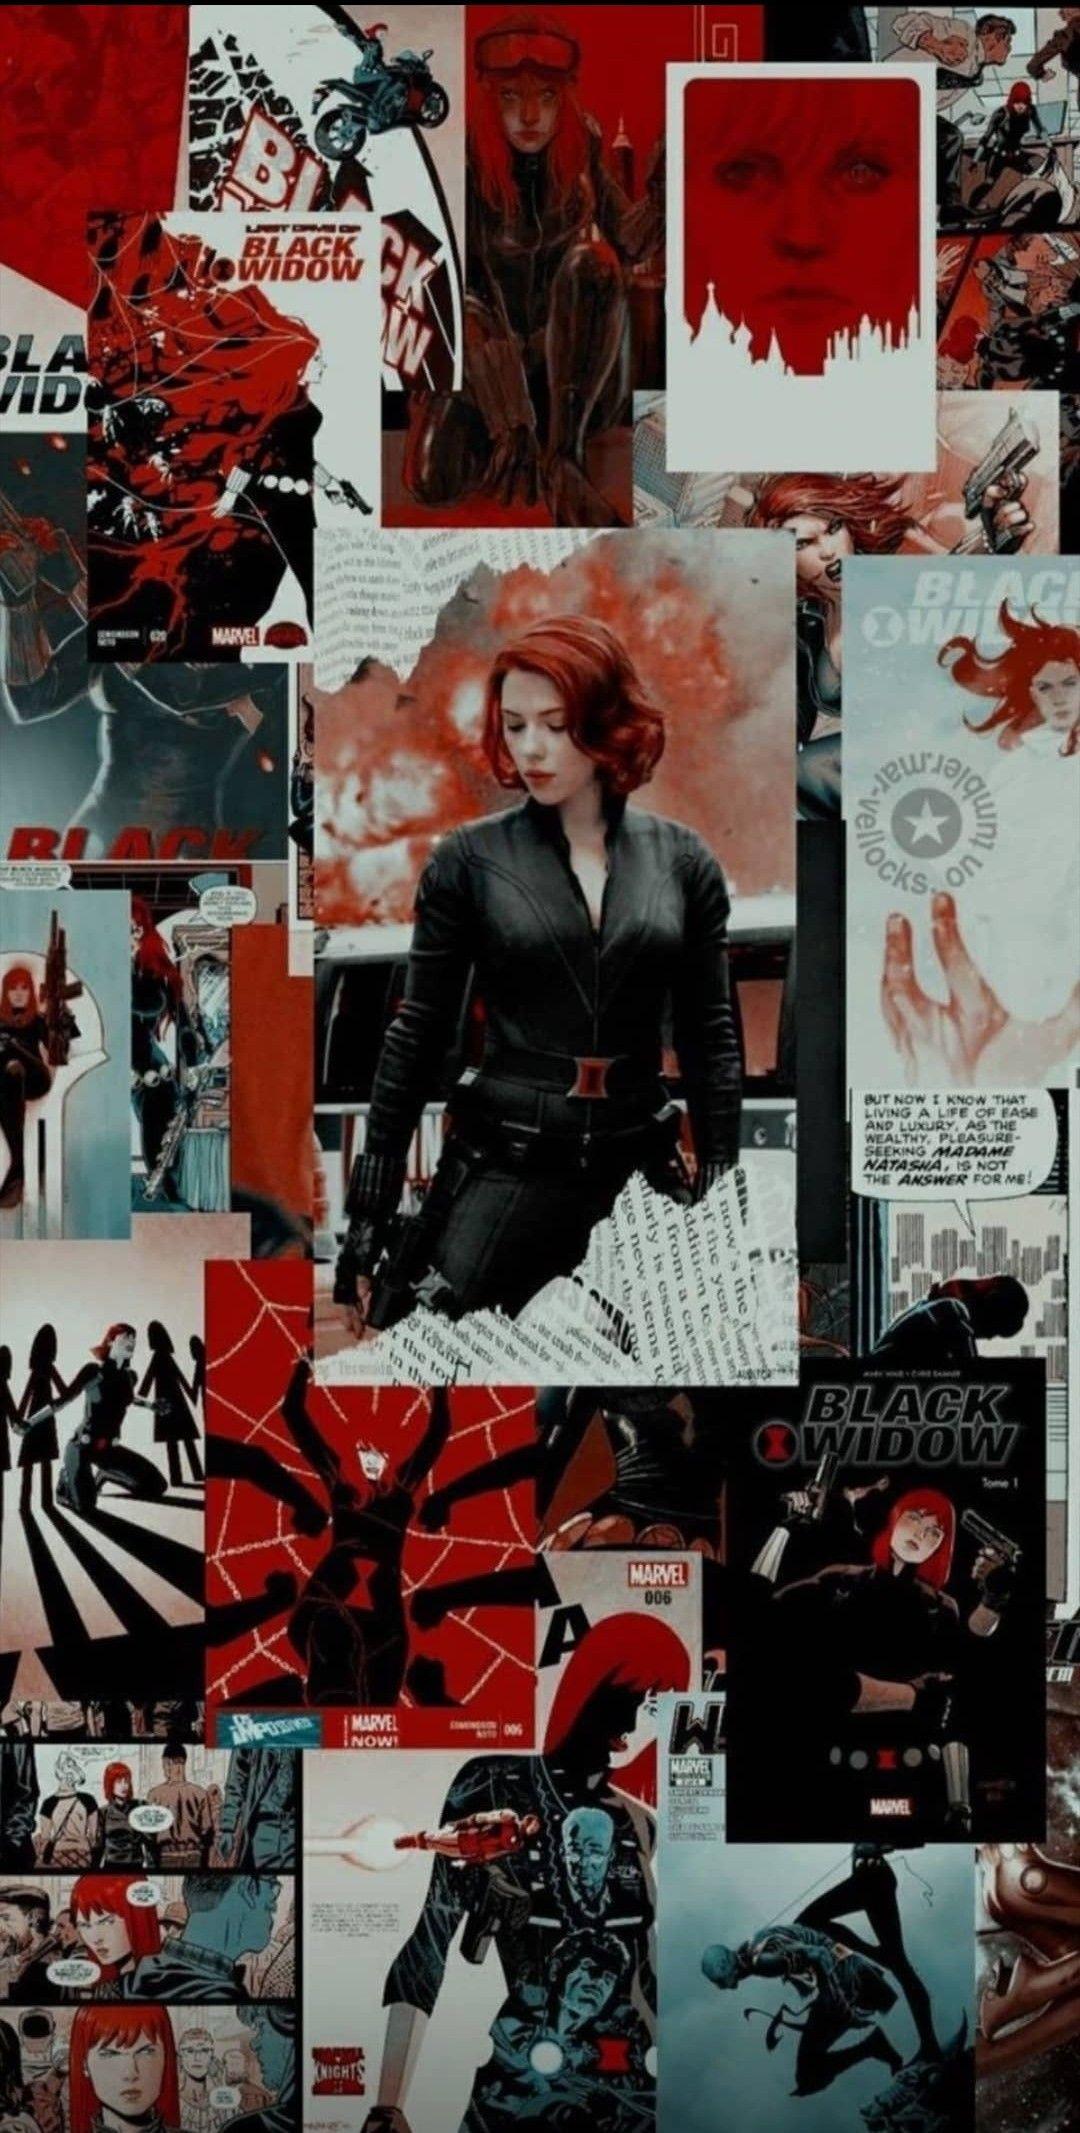 Black Widow Wallpaper Viuda Negra Marvel Avengers Marvel Comics Wallpaper Marvel Avengers Movies Marvel Background